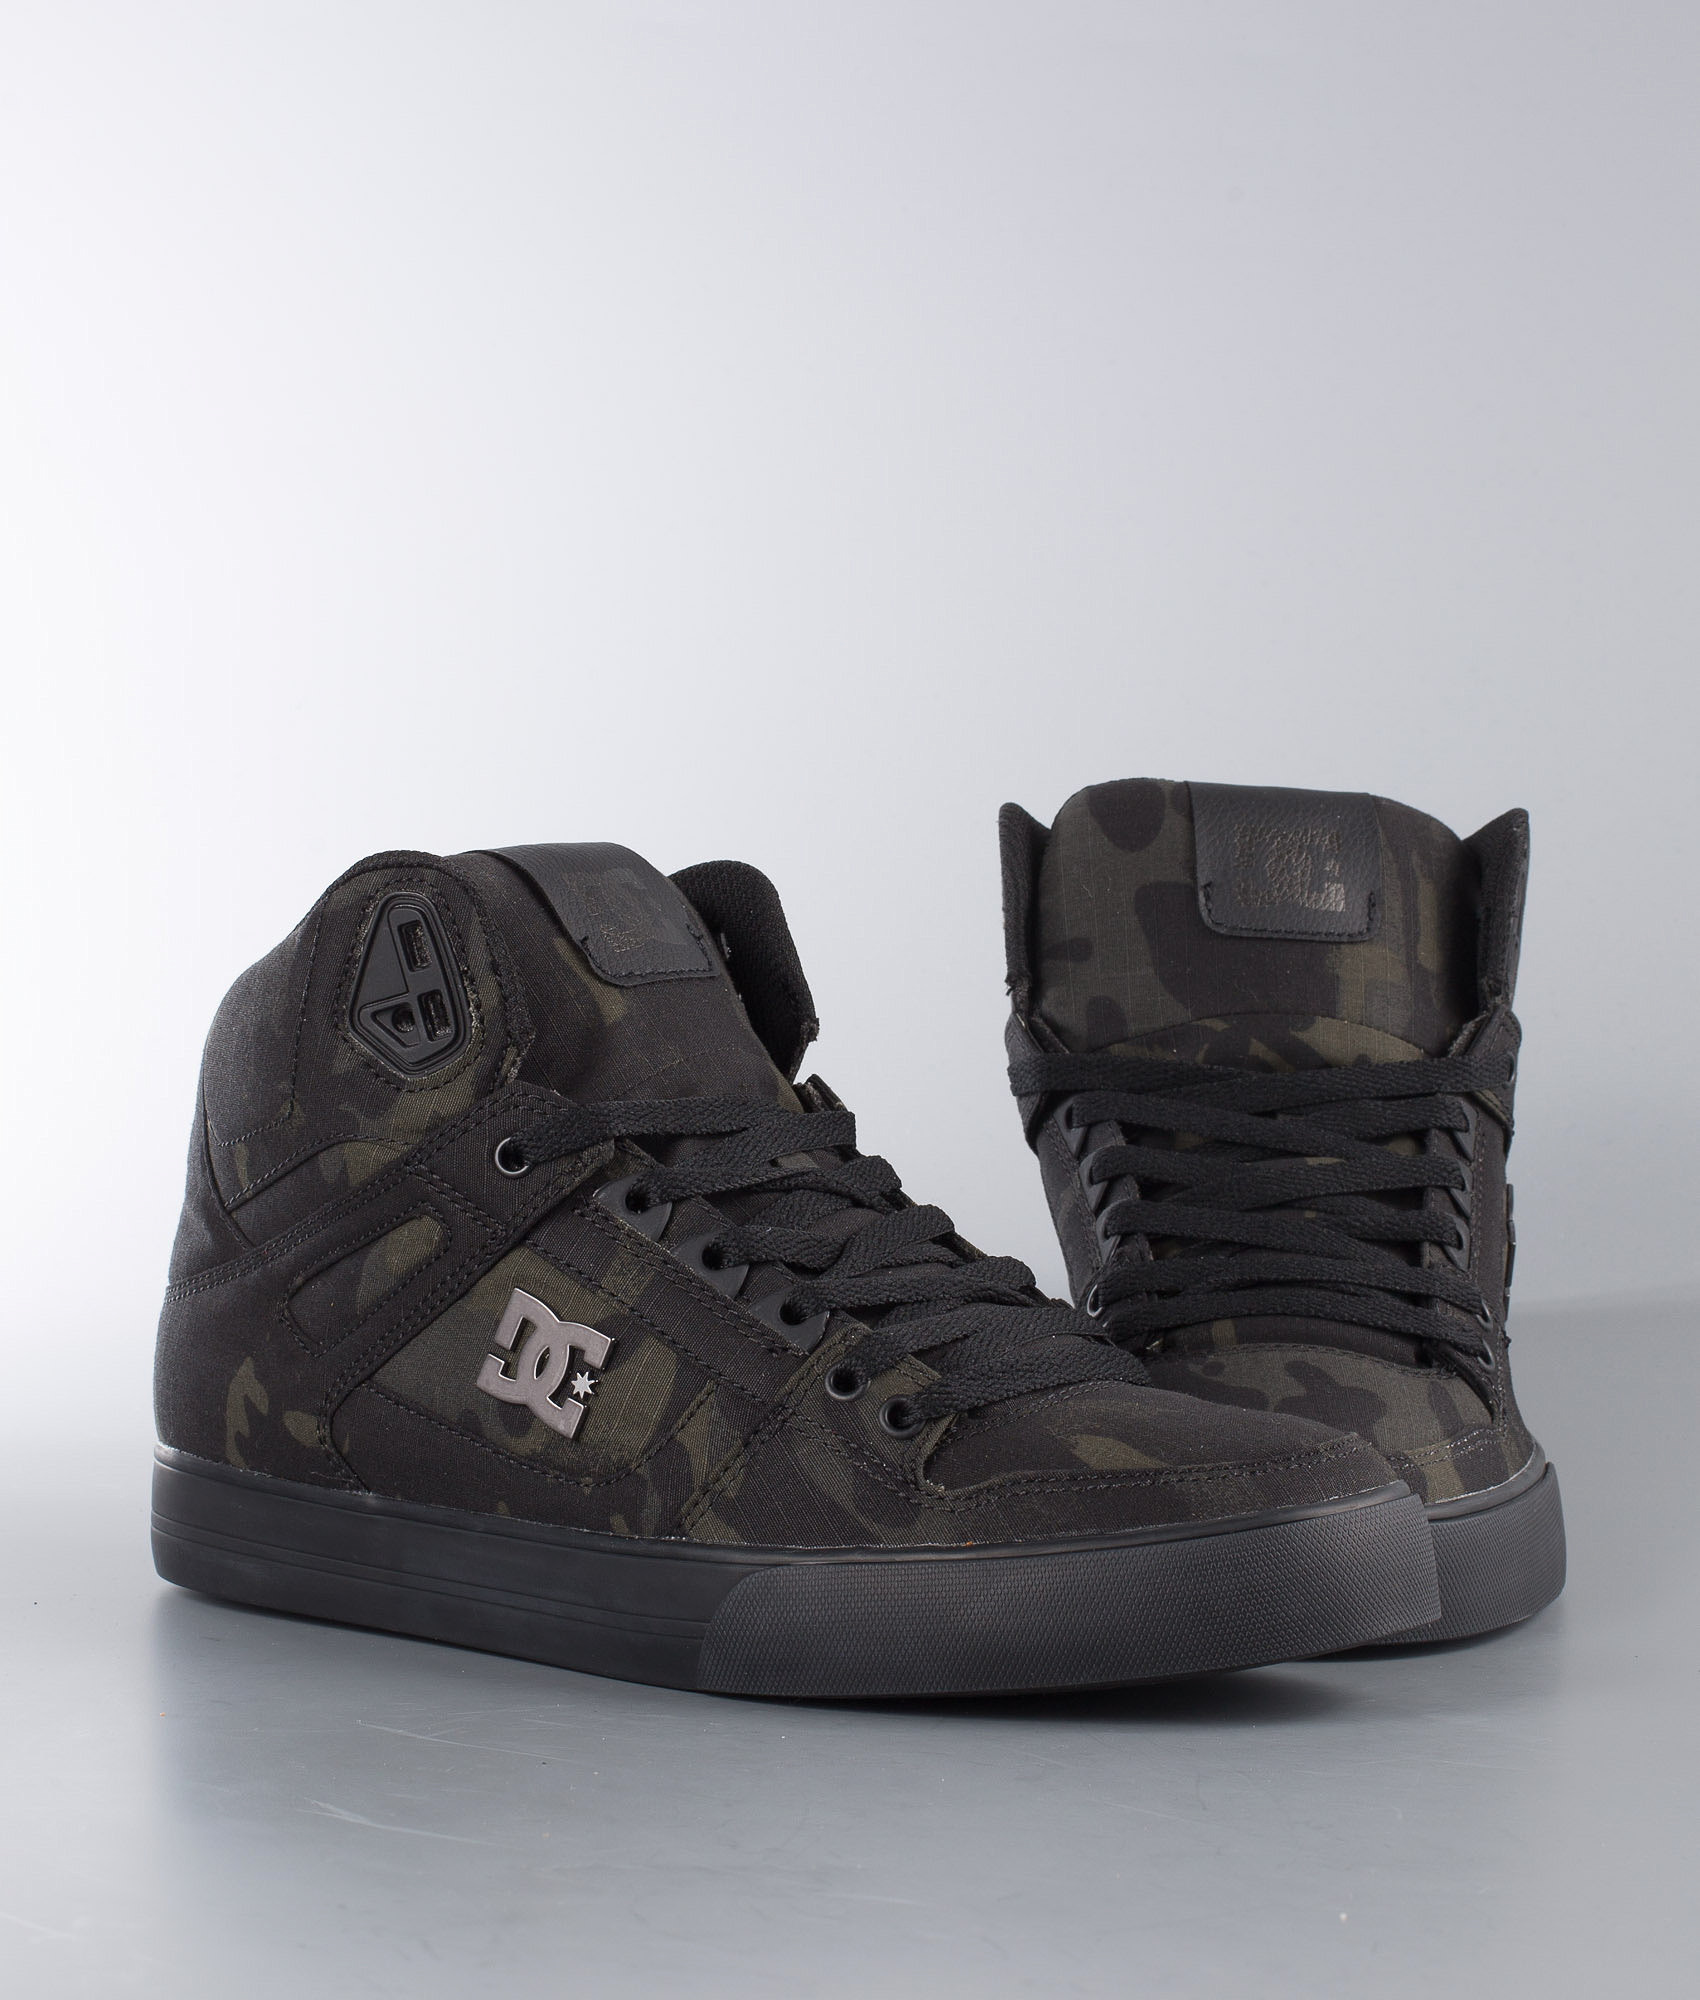 0837f5e8f30 DC Pure High-Top Wc Tx Se Shoes Camo - Ridestore.com